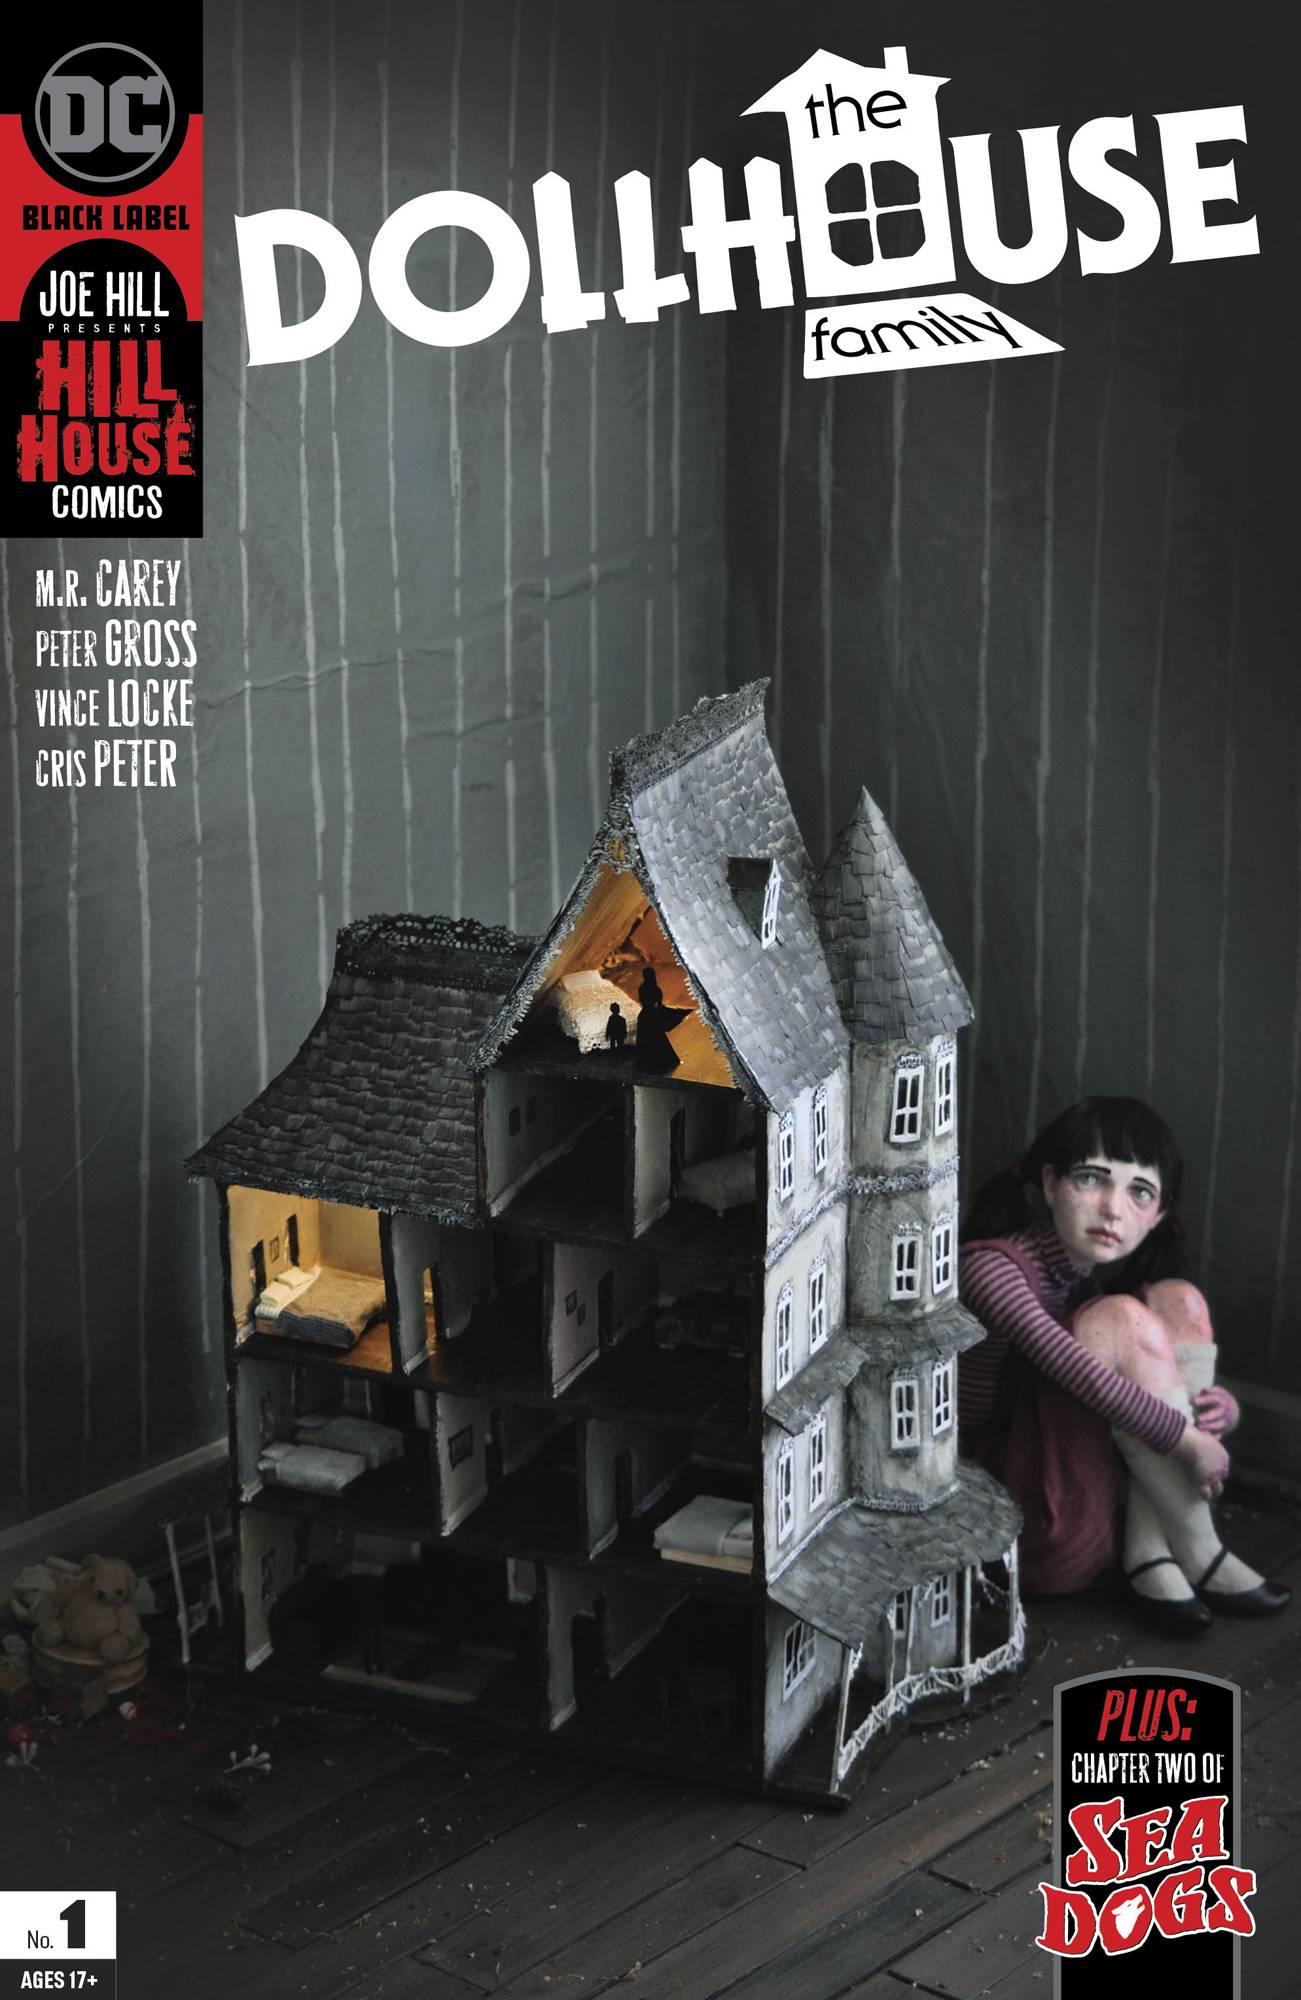 The Dollhouse Family #1 (2019)